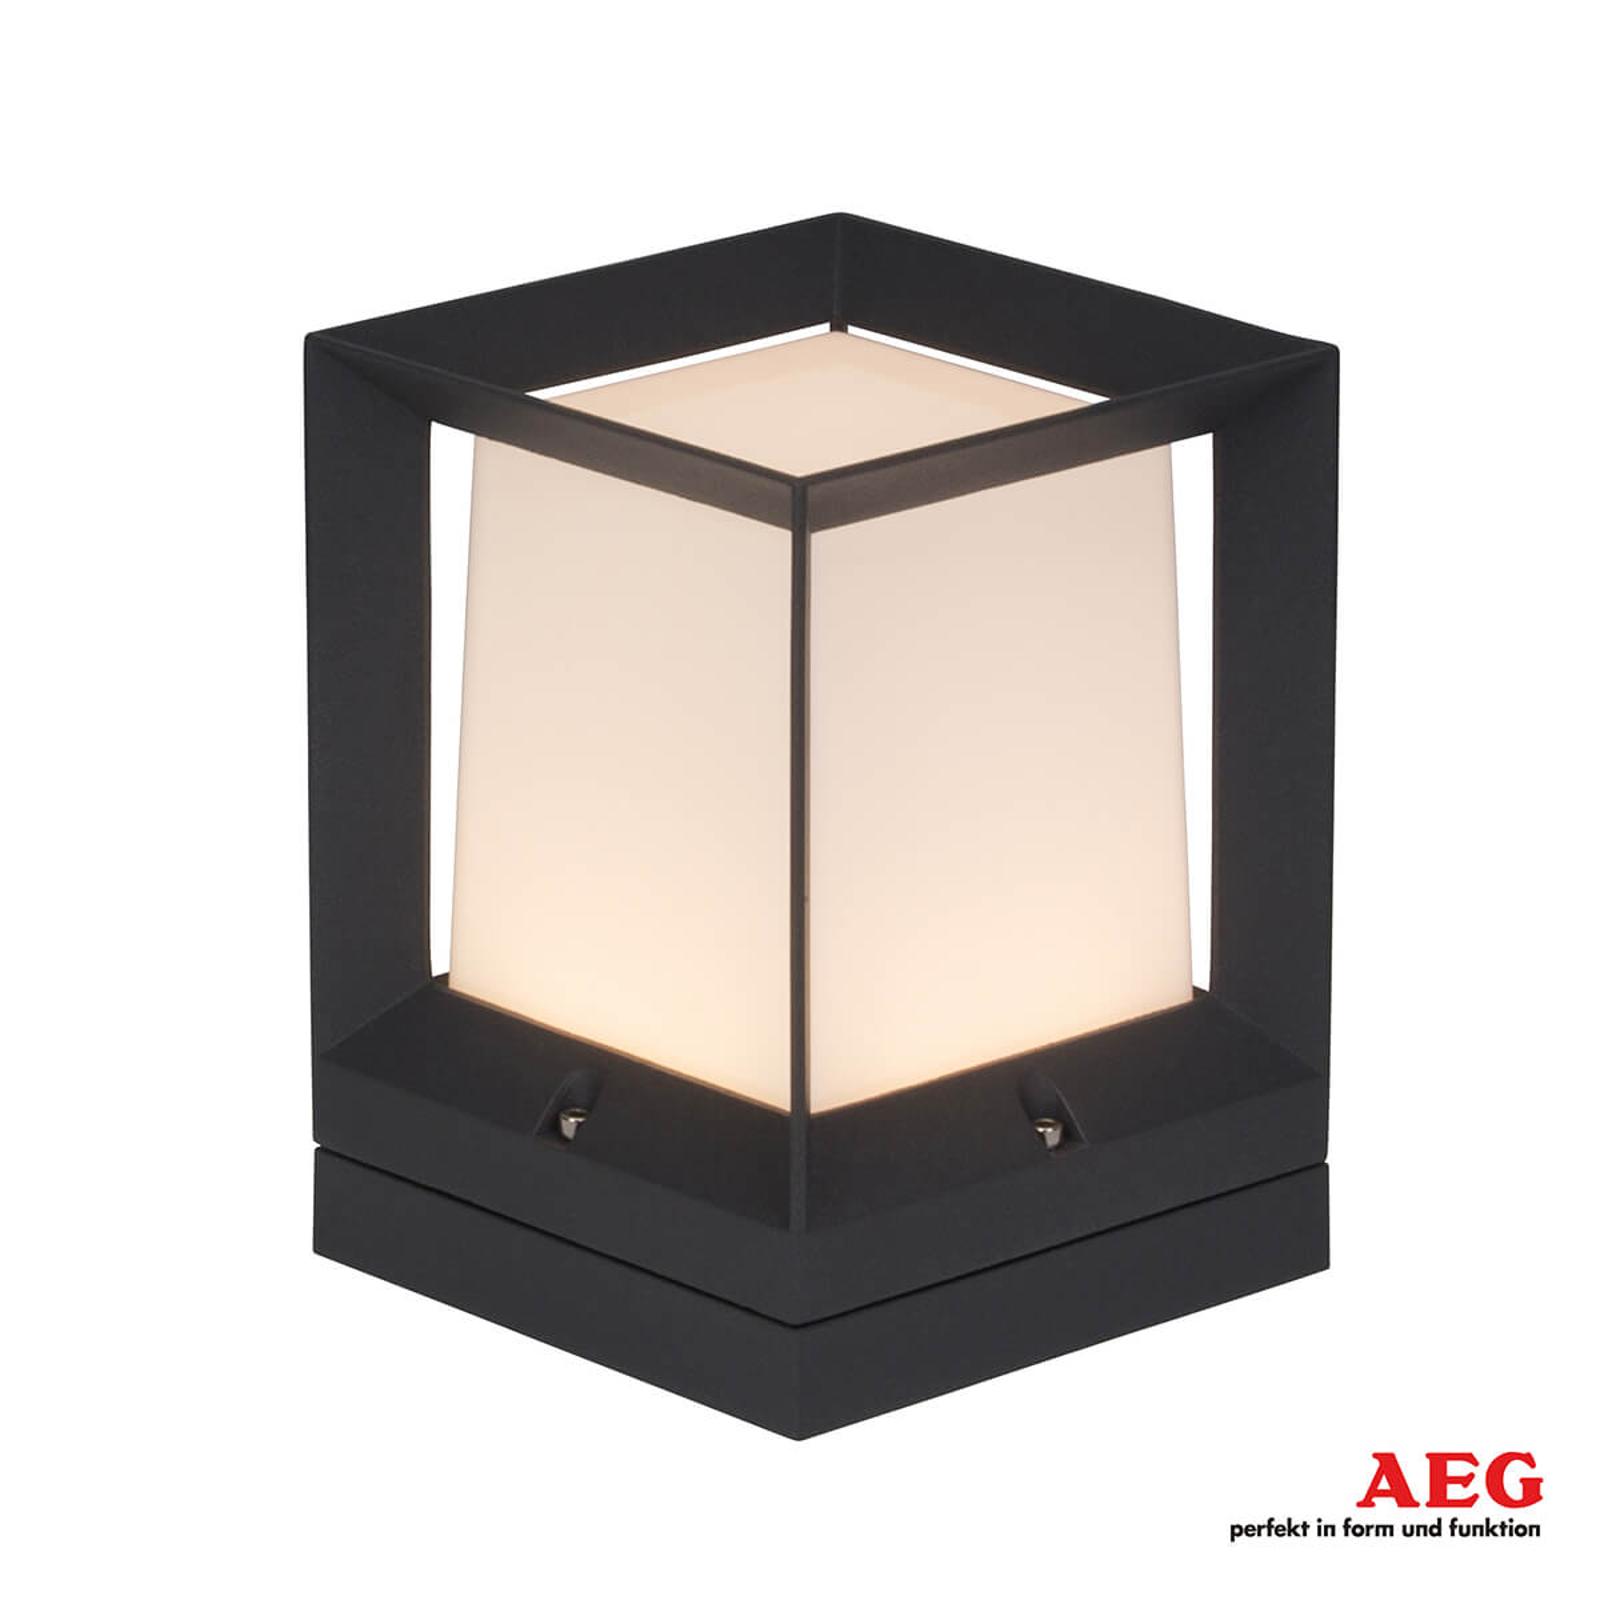 AEG Kubus - eckige LED-Sockelleuchte